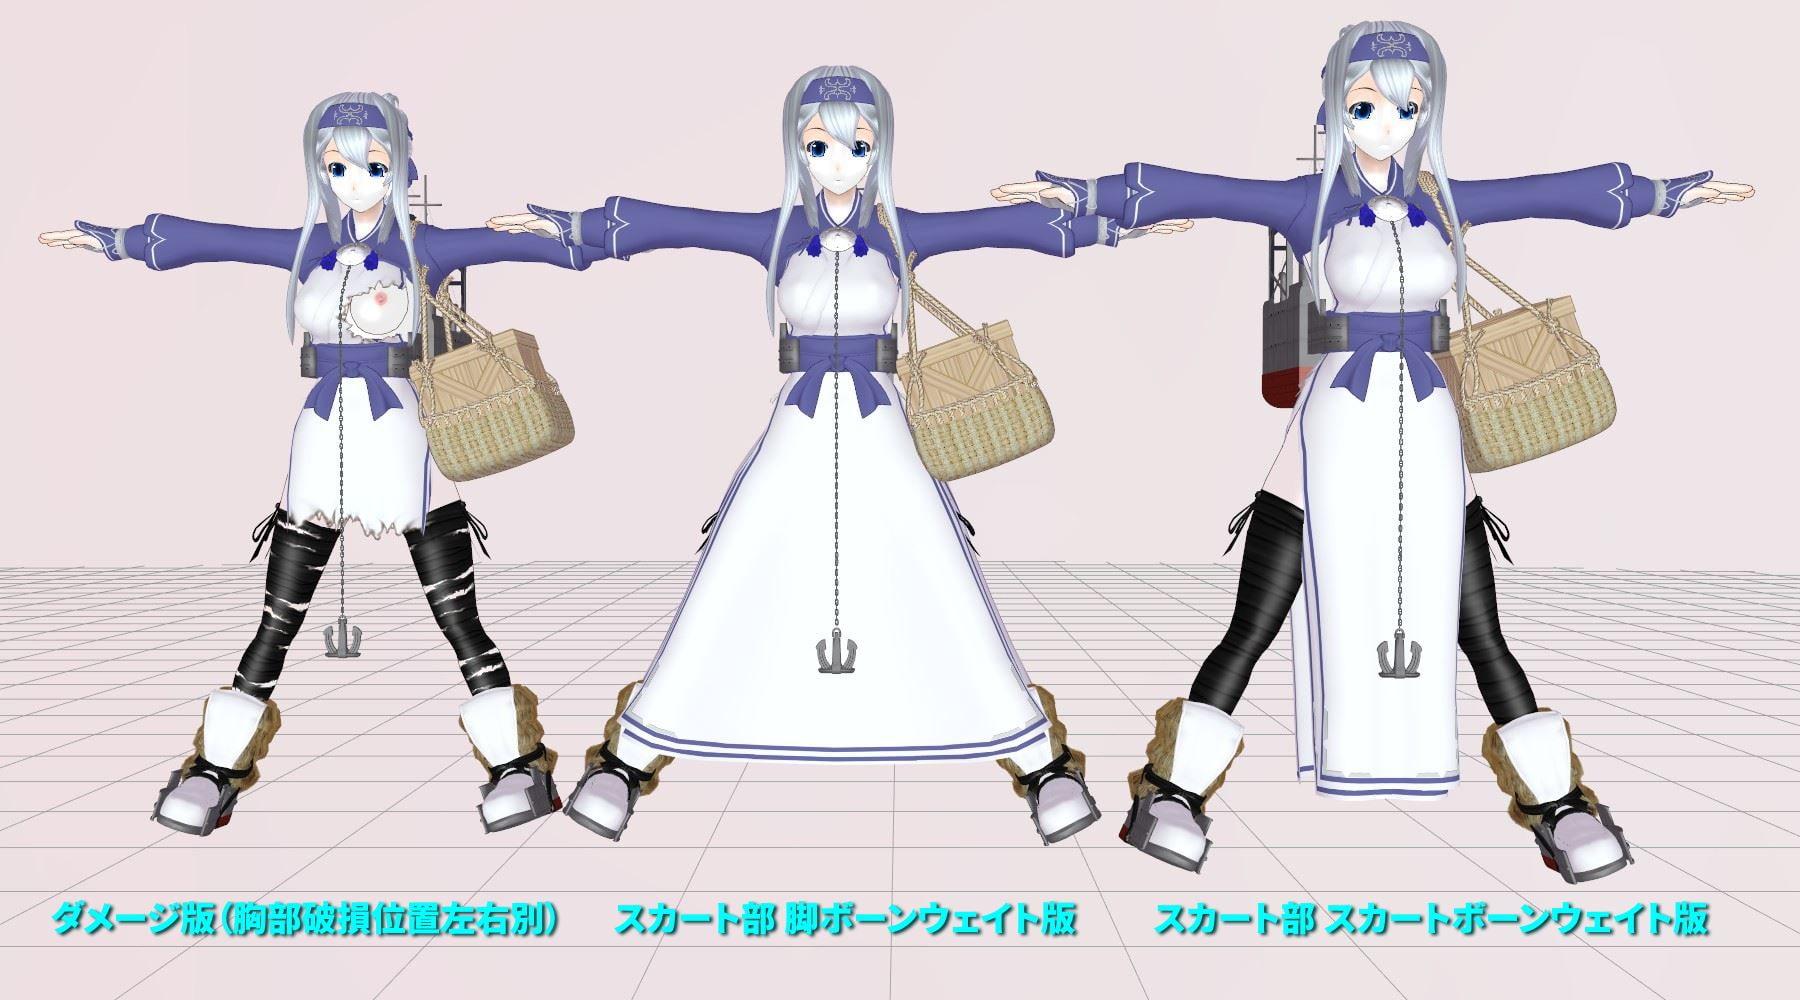 "3Dカスタム少女用追加衣装セット ""3Dカスタム 補給艦娘"""